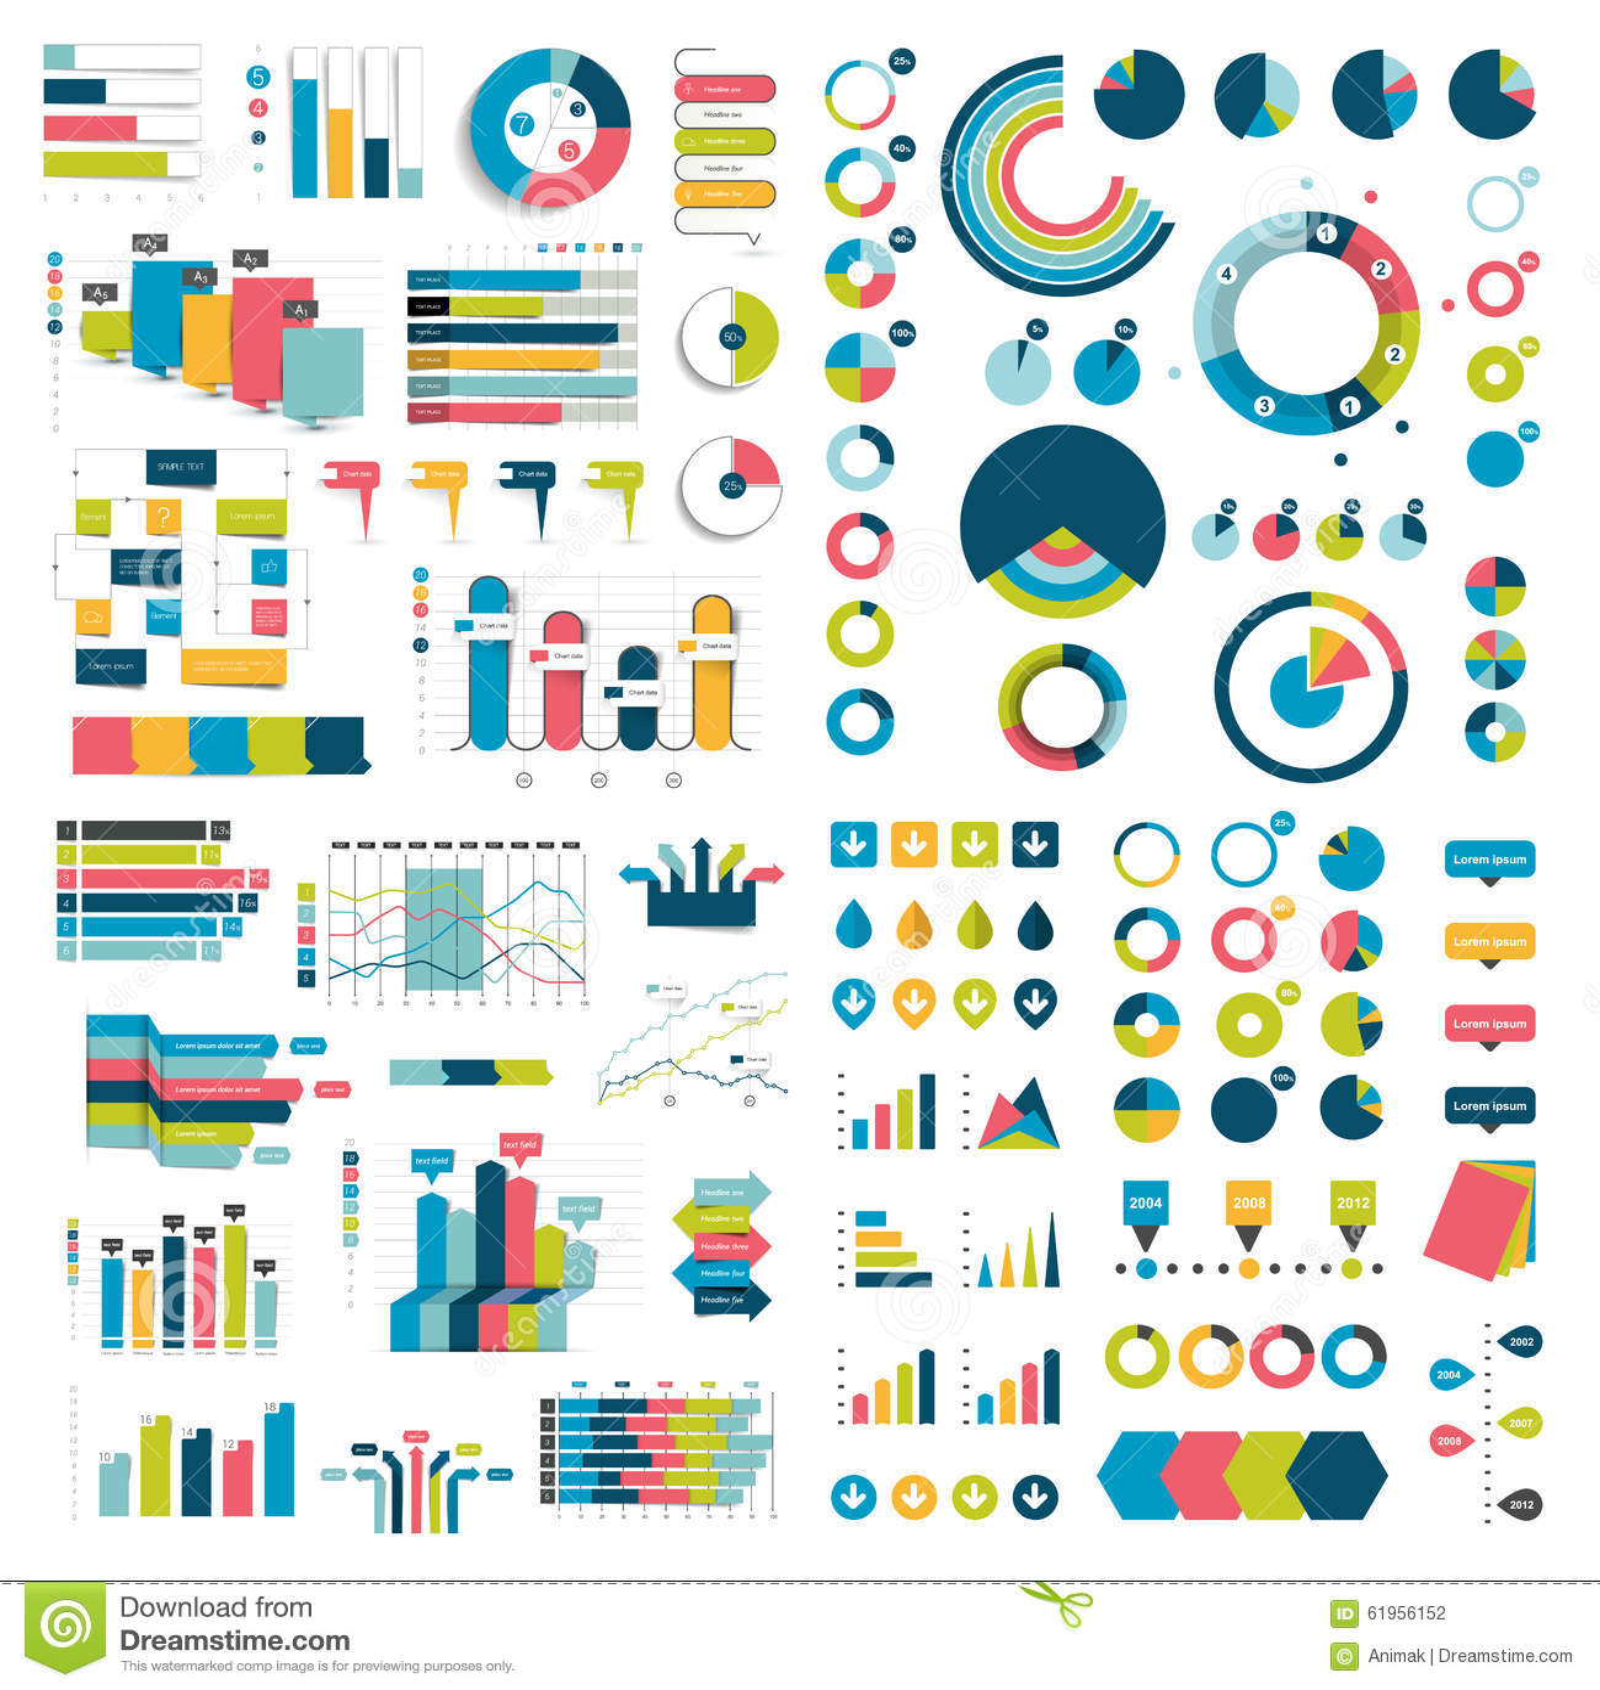 Mega- Sammlung Diagramme, Diagramme, Flussdiagramme, Diagramme und infographics Elemente